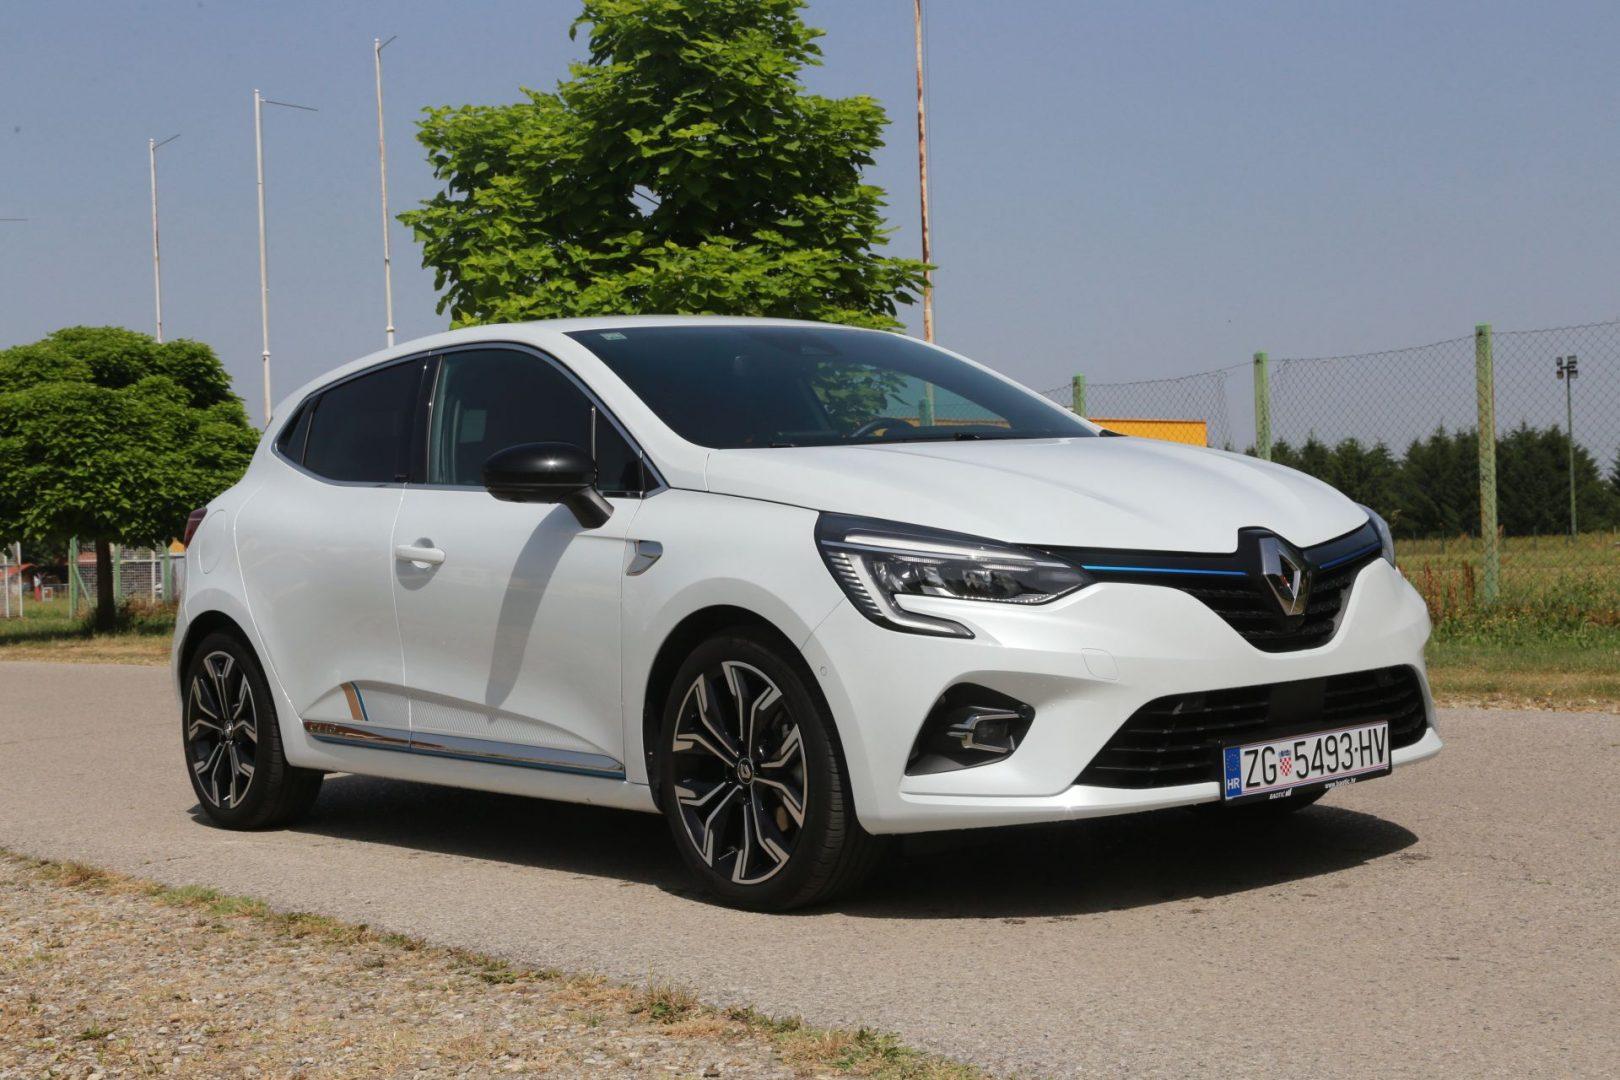 TEST: Renault Clio E-Tech 140 Hibrid Edition – Sportski nastrojen štedljivko